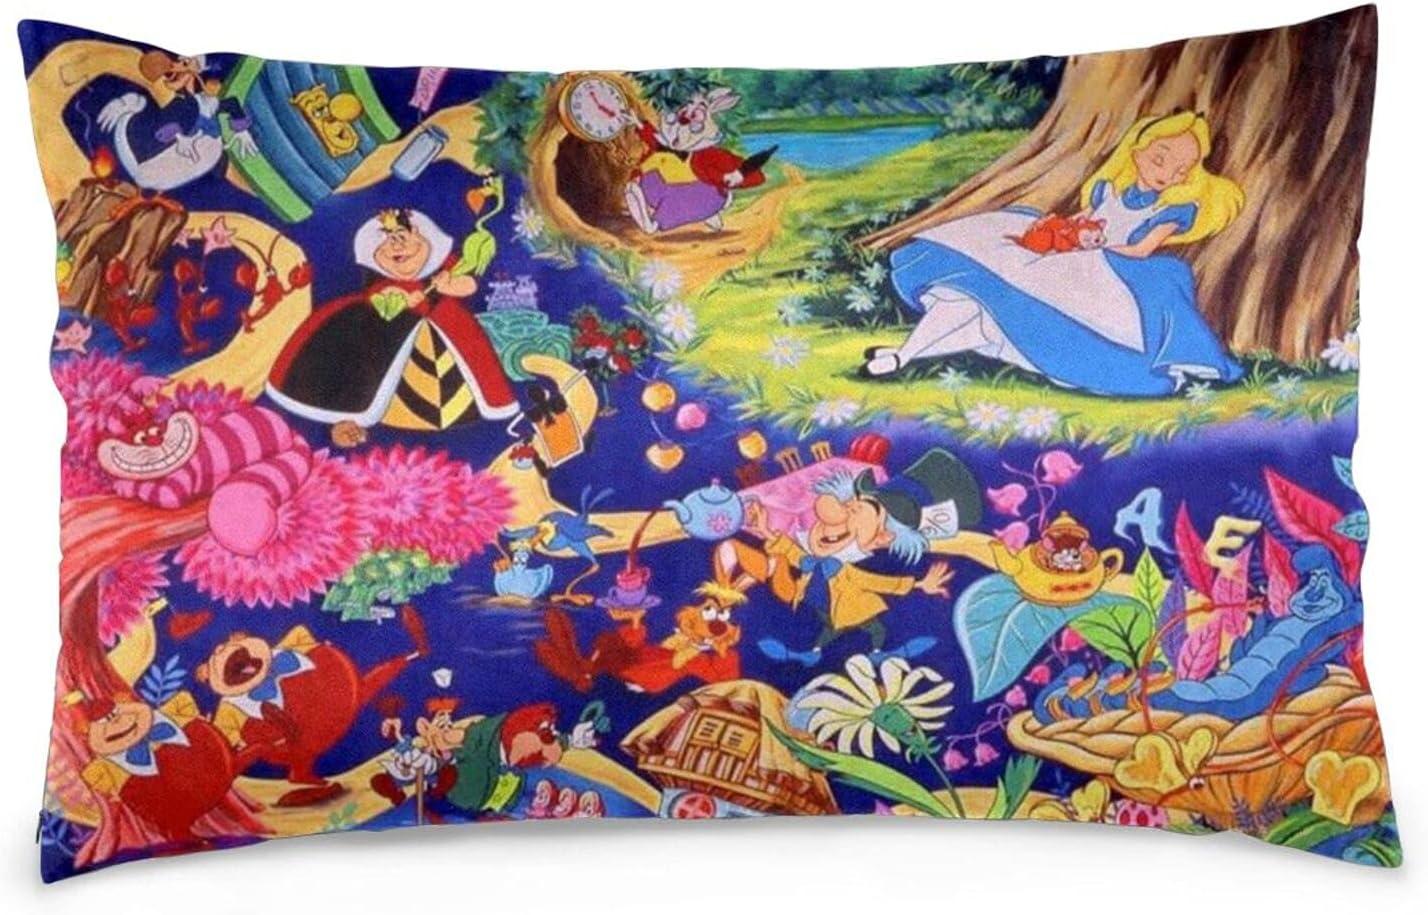 SIFIYHA Alice in Wonderland Pillow Cases with Hidden Zipper Supe